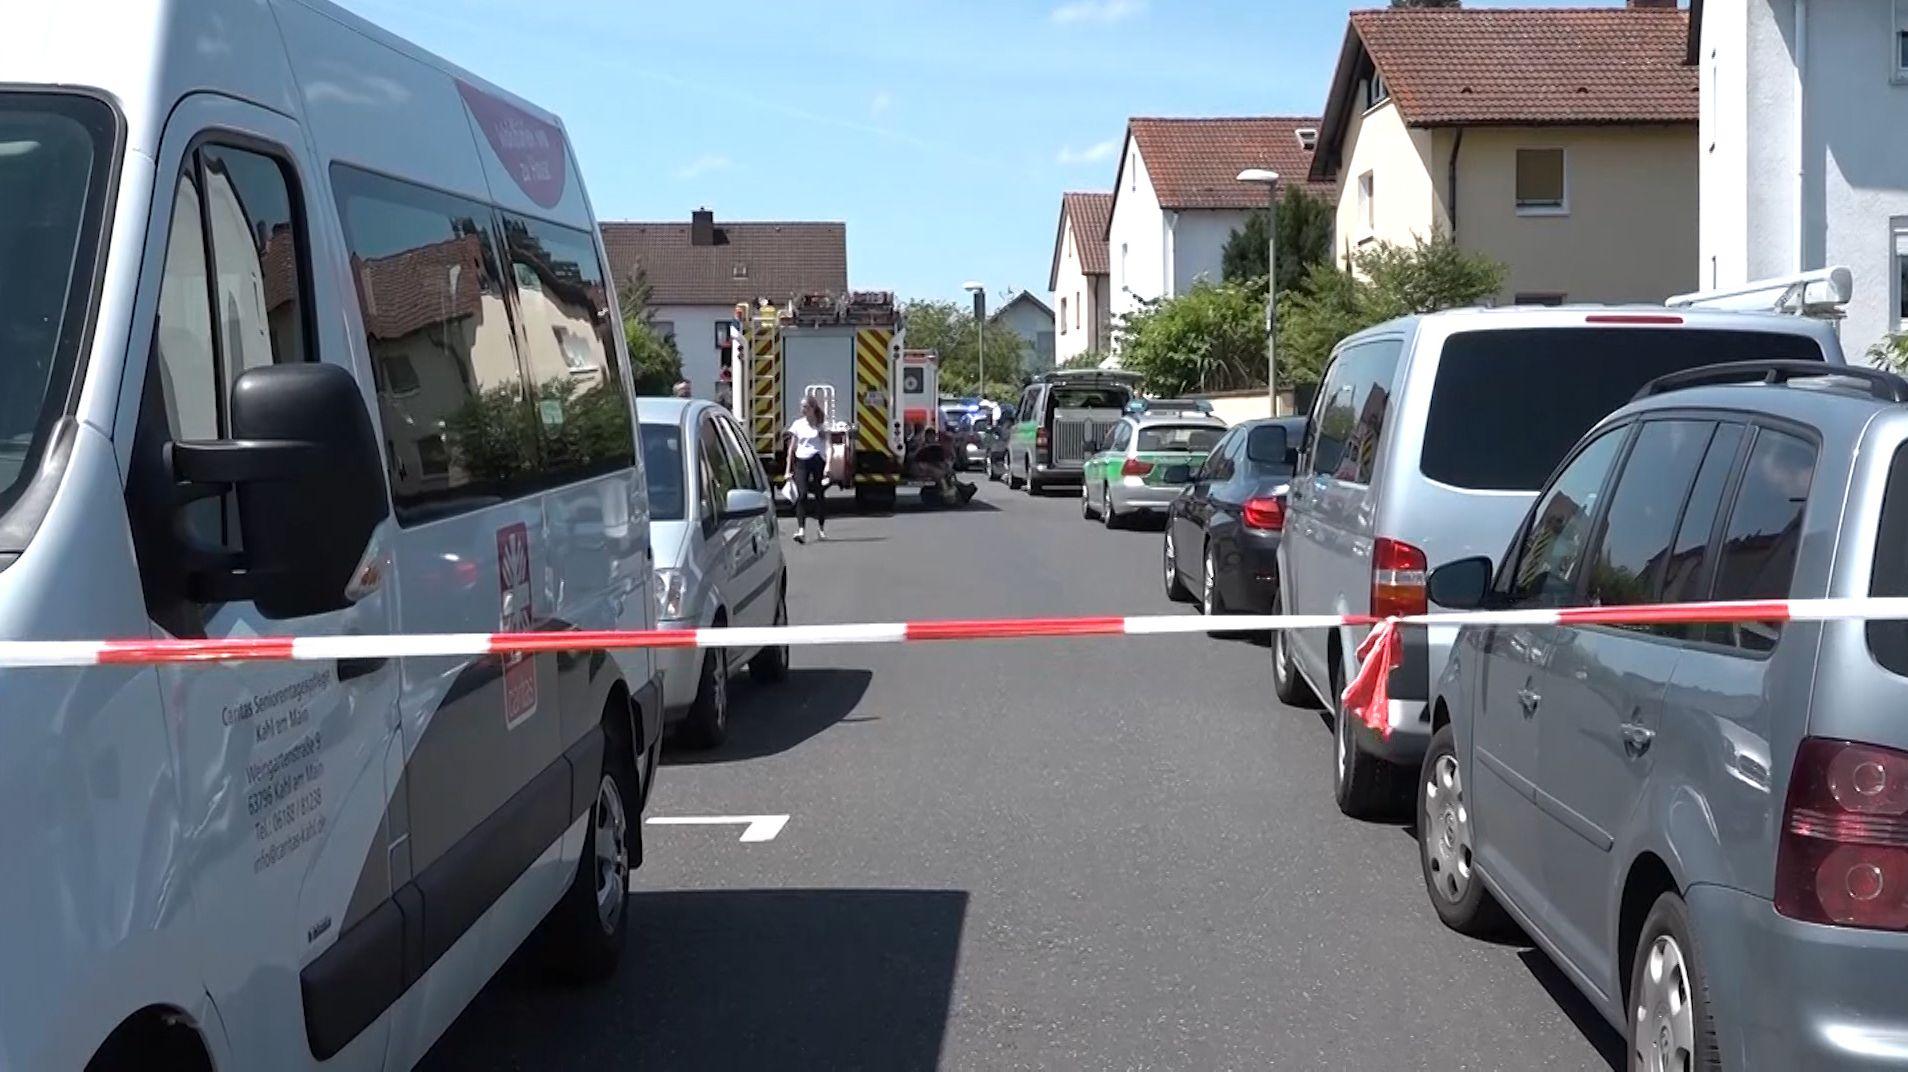 Agesperrter Tatort in Kahl am Main